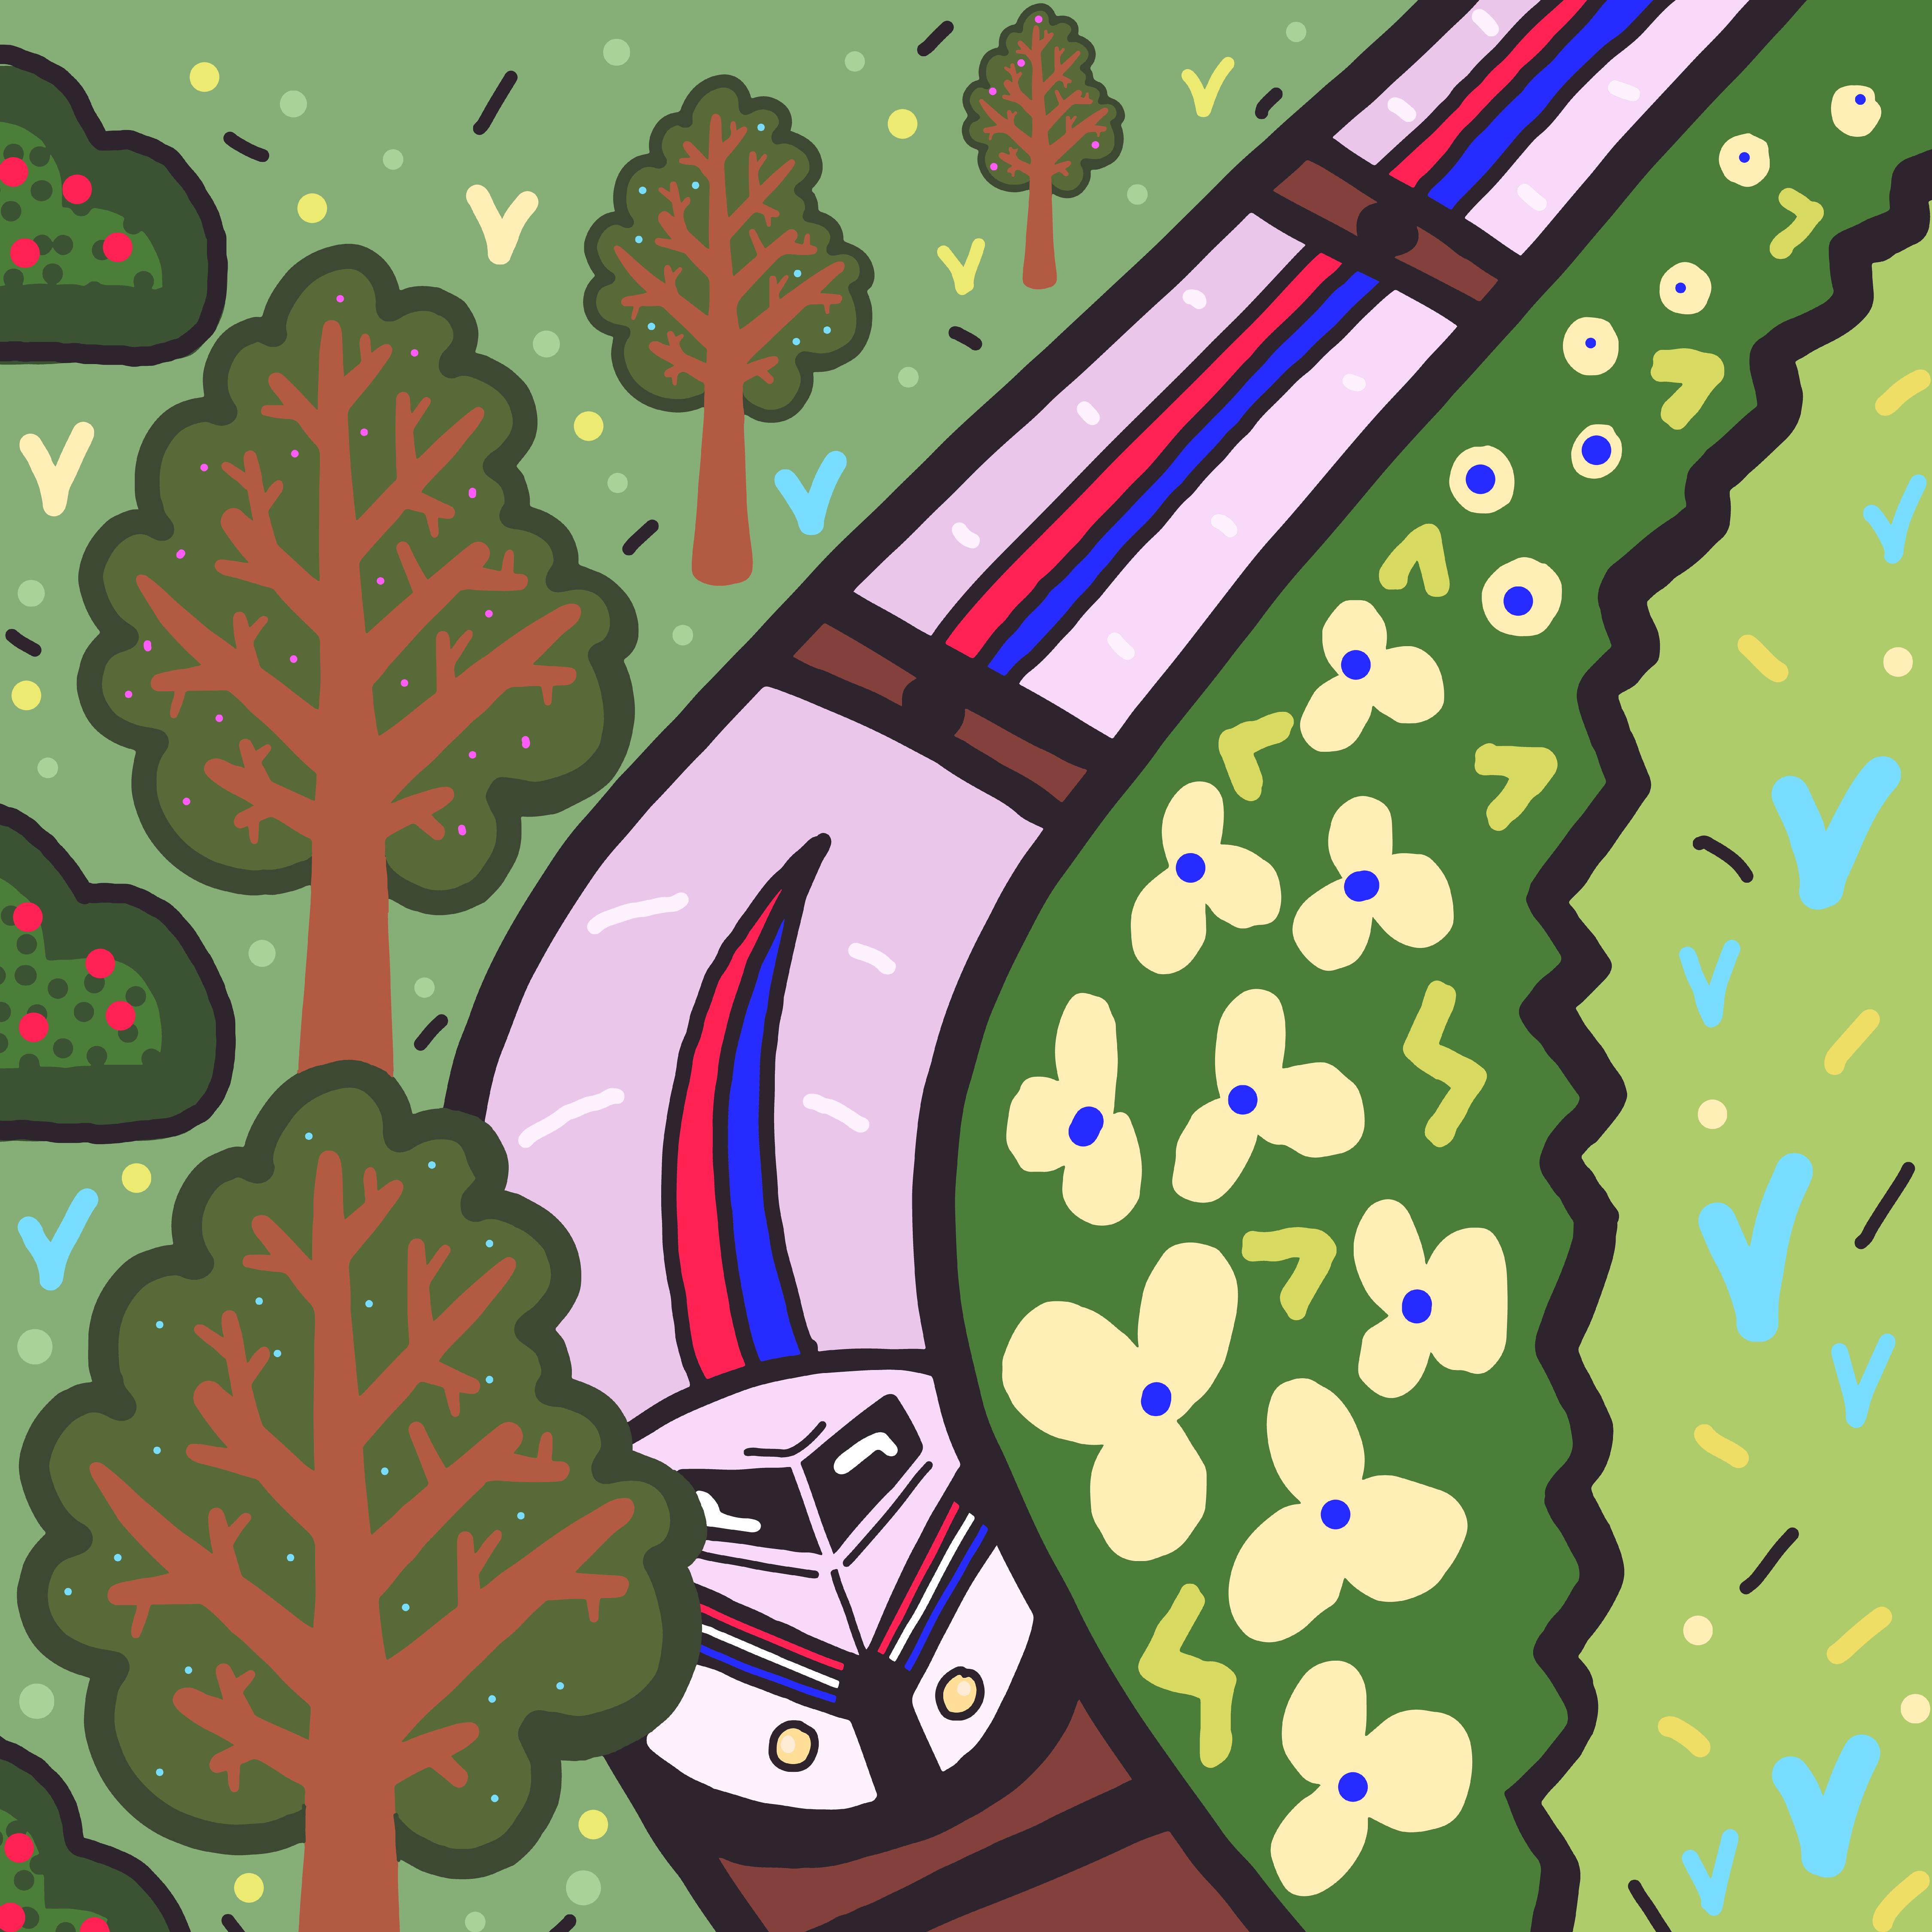 Train illustration by Mina Tocalini